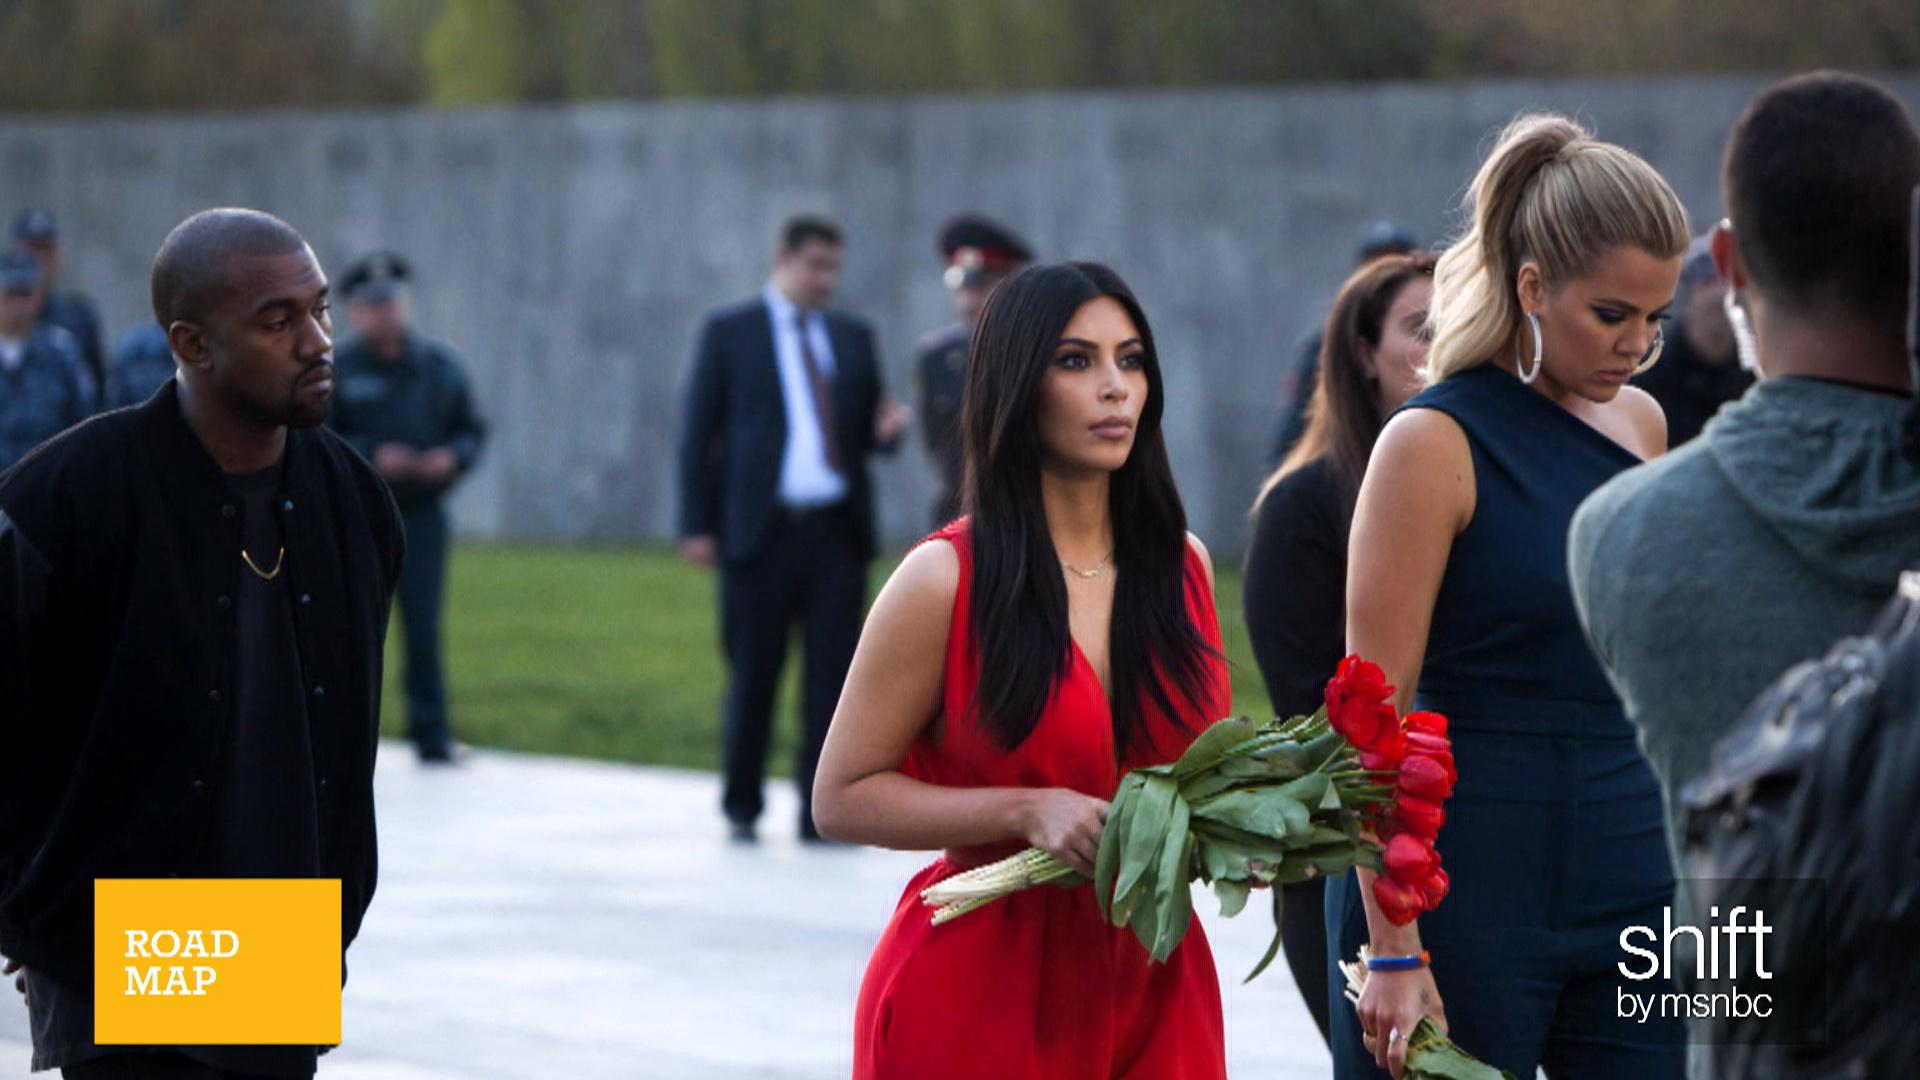 Kim Kardashian & the Pope find common ground